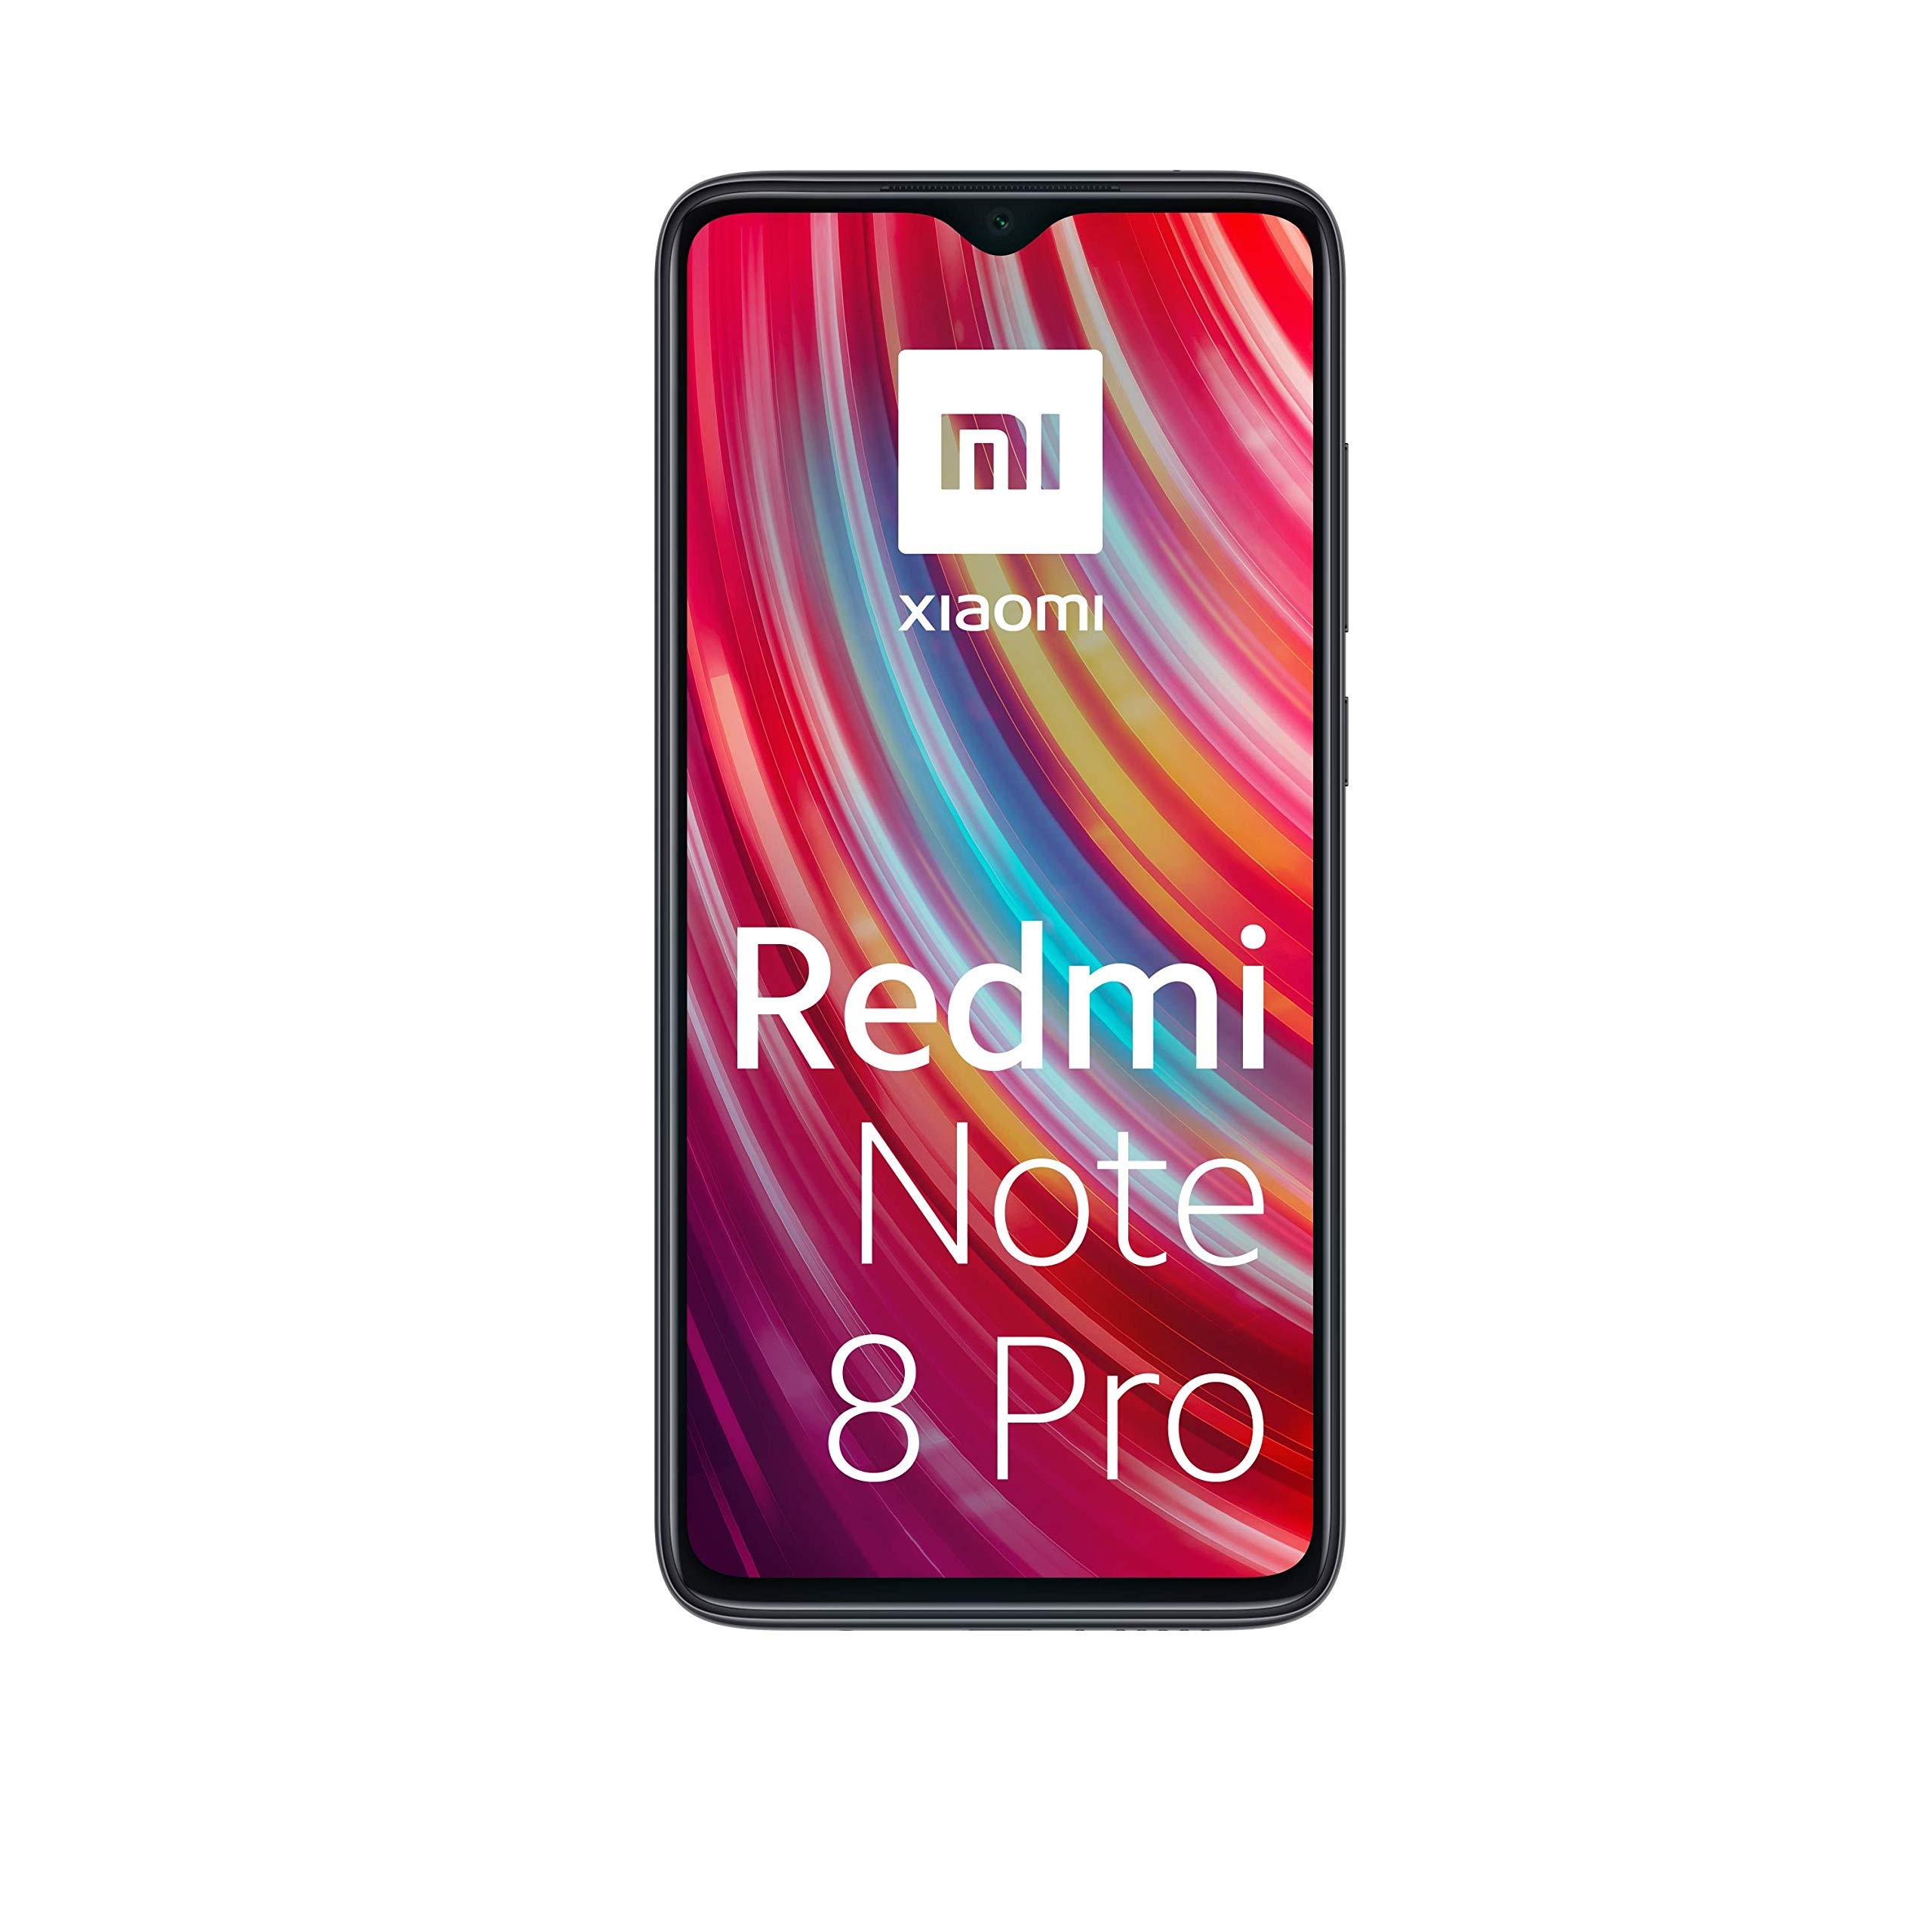 Xiaomi Redmi Note 8 Pro Dual SIM 128GB 6GB RAM Gray